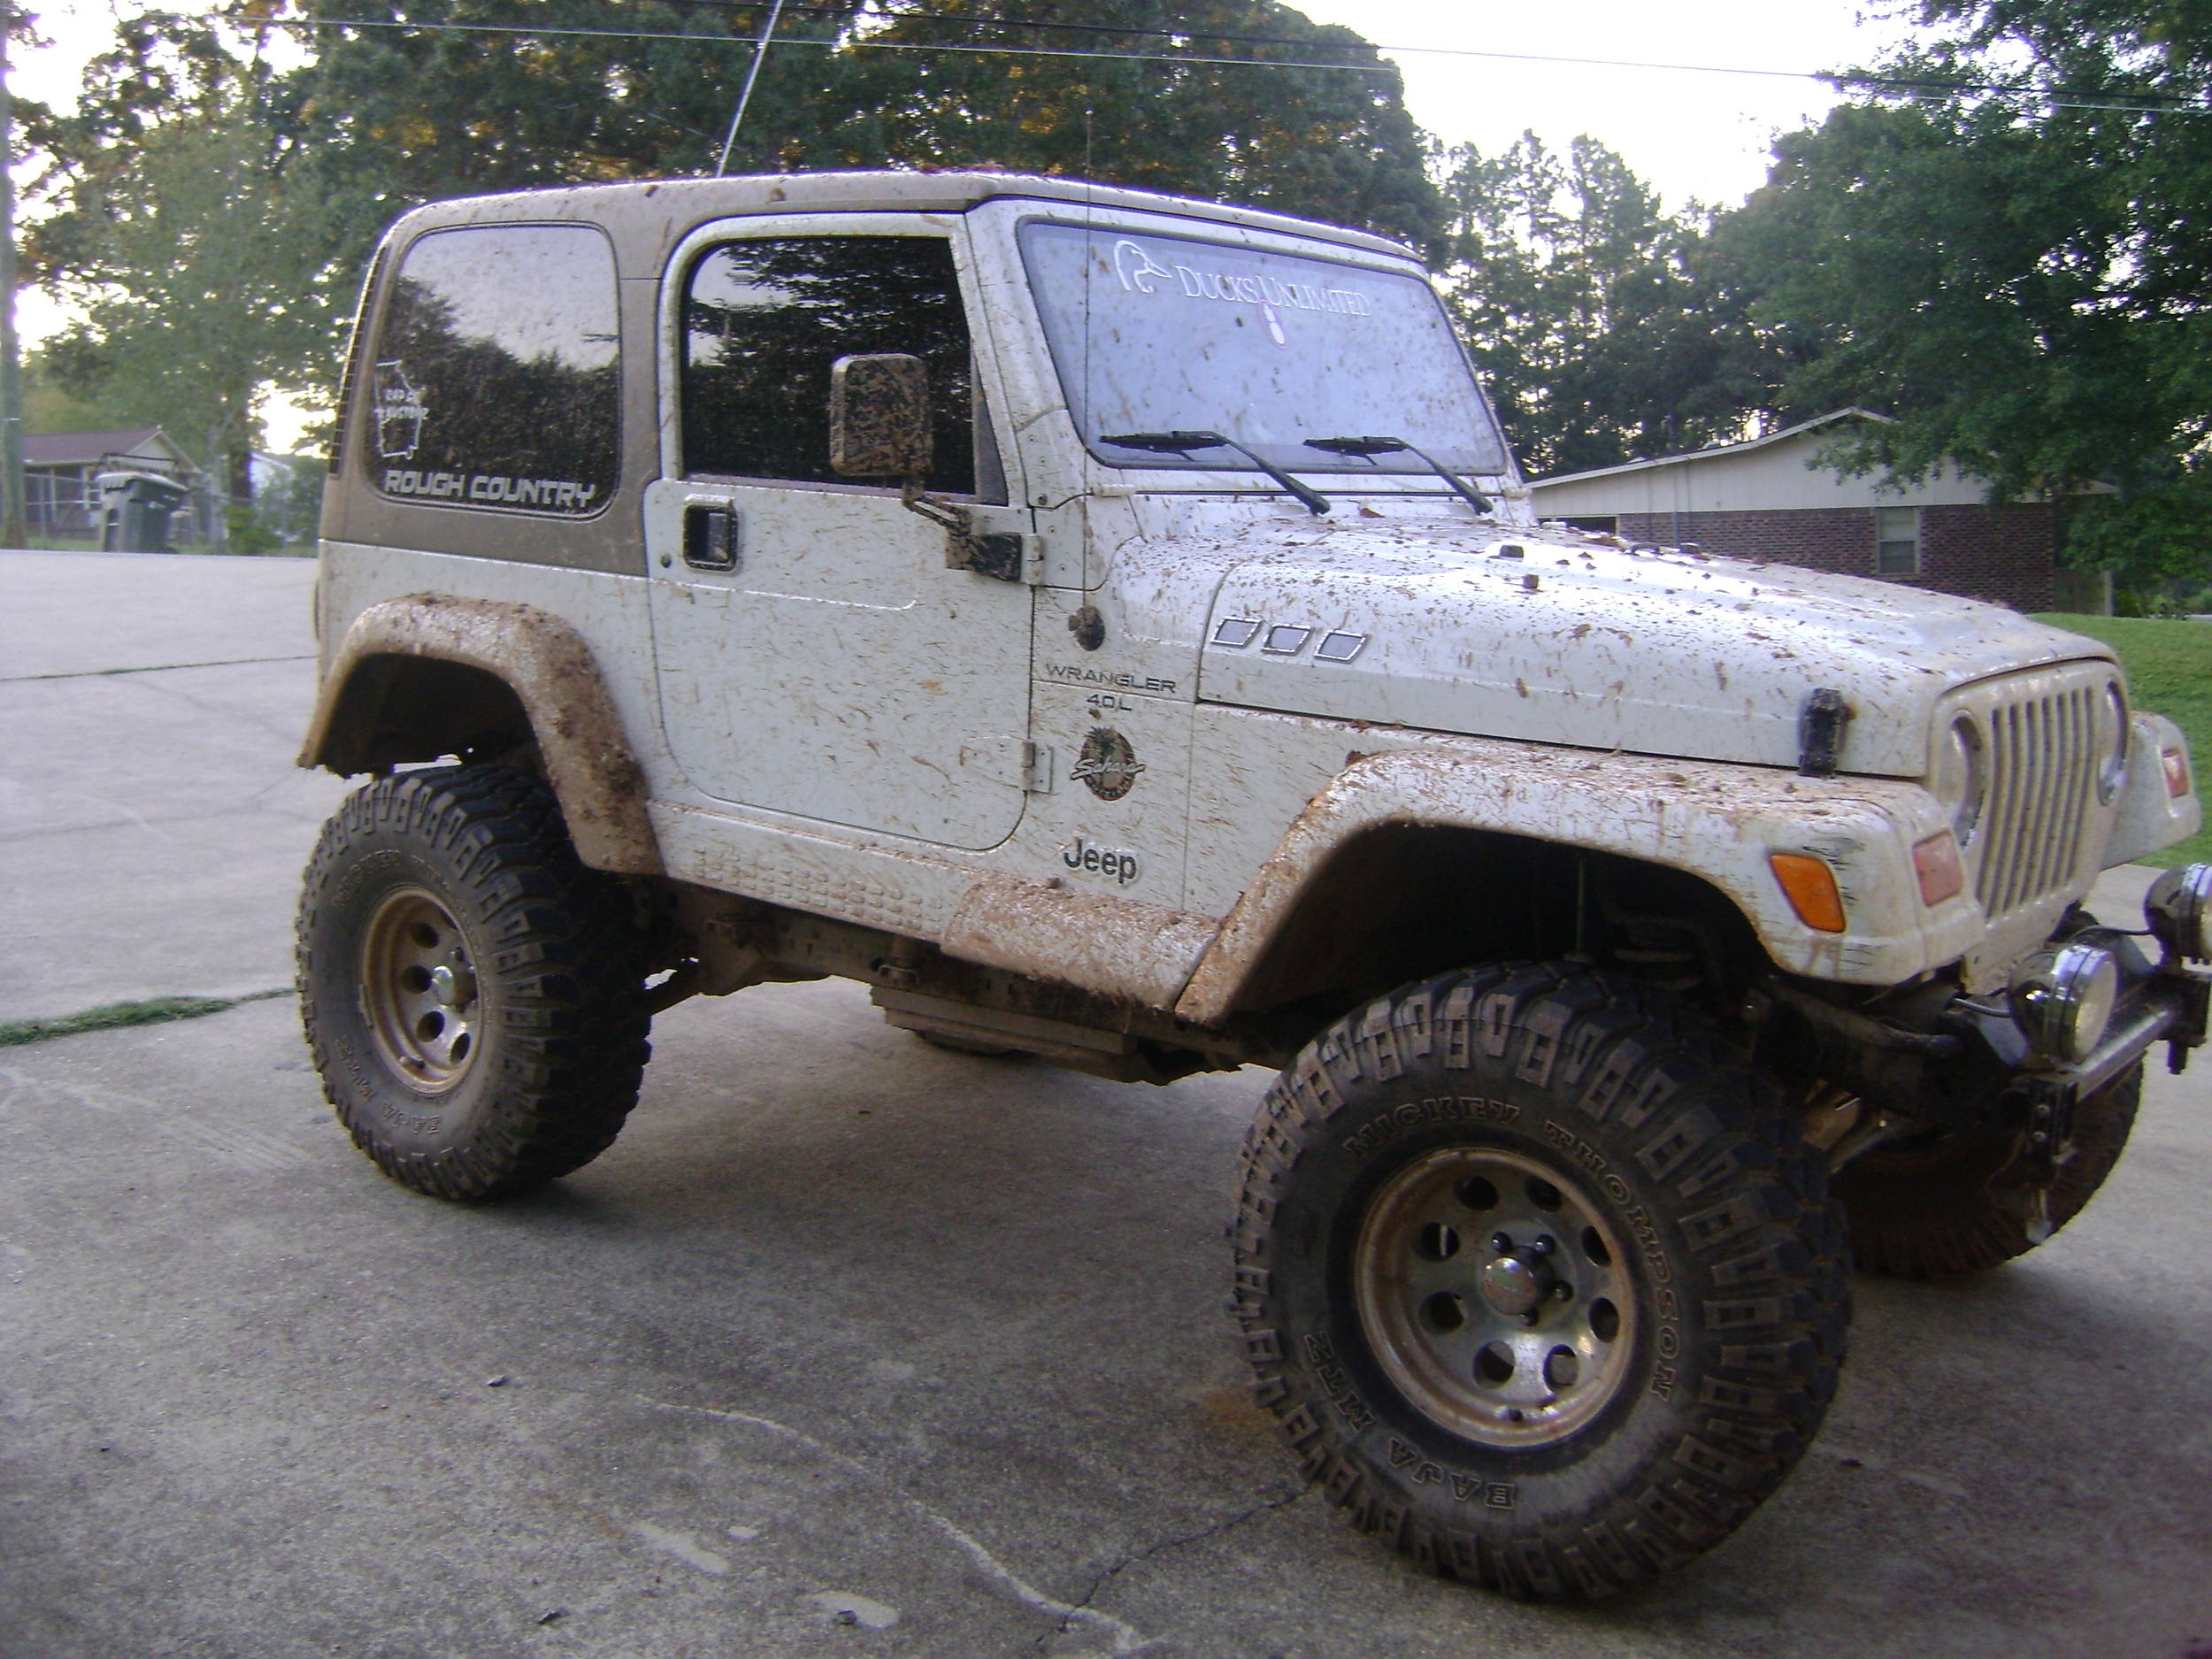 DSC001441.JPG